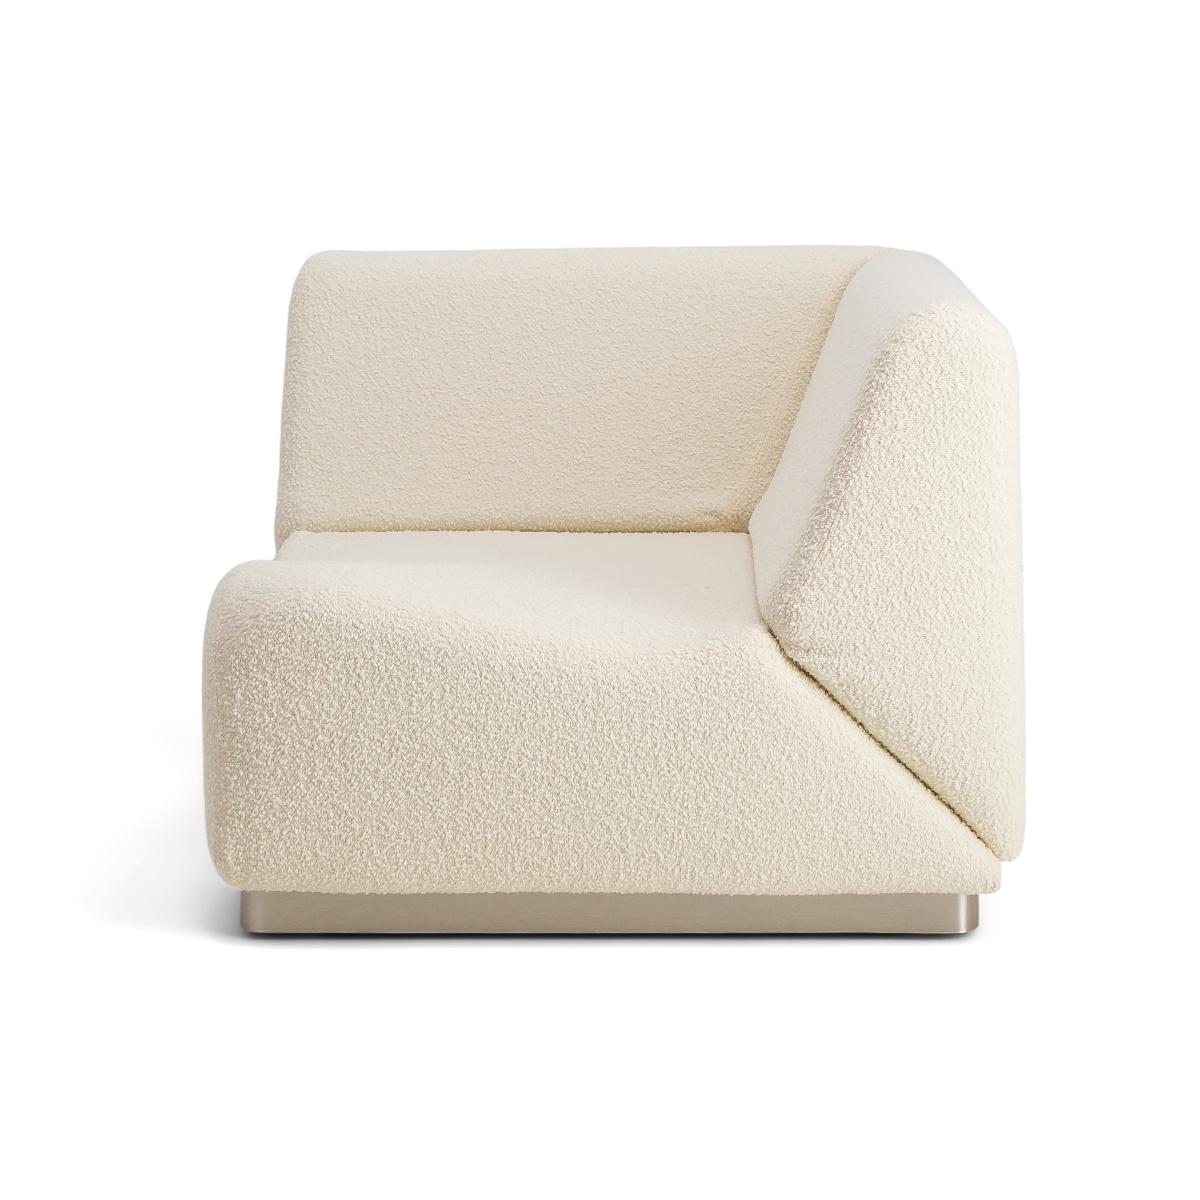 Rotondo Corner Module in Cream White Curly Wool